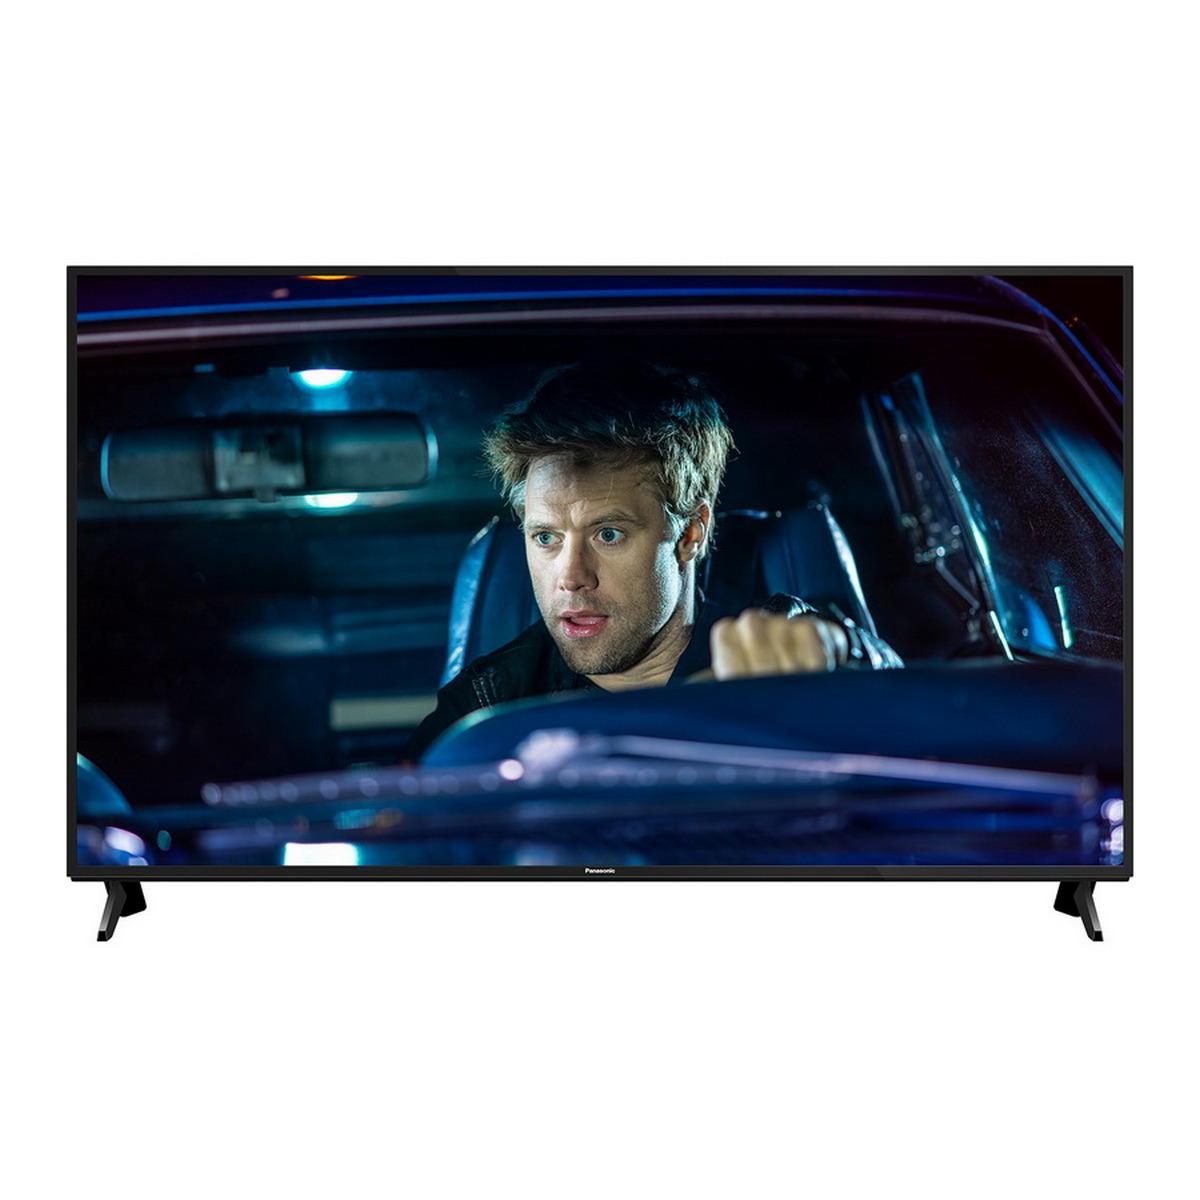 Panasonic Smart TV TH-65GX600T